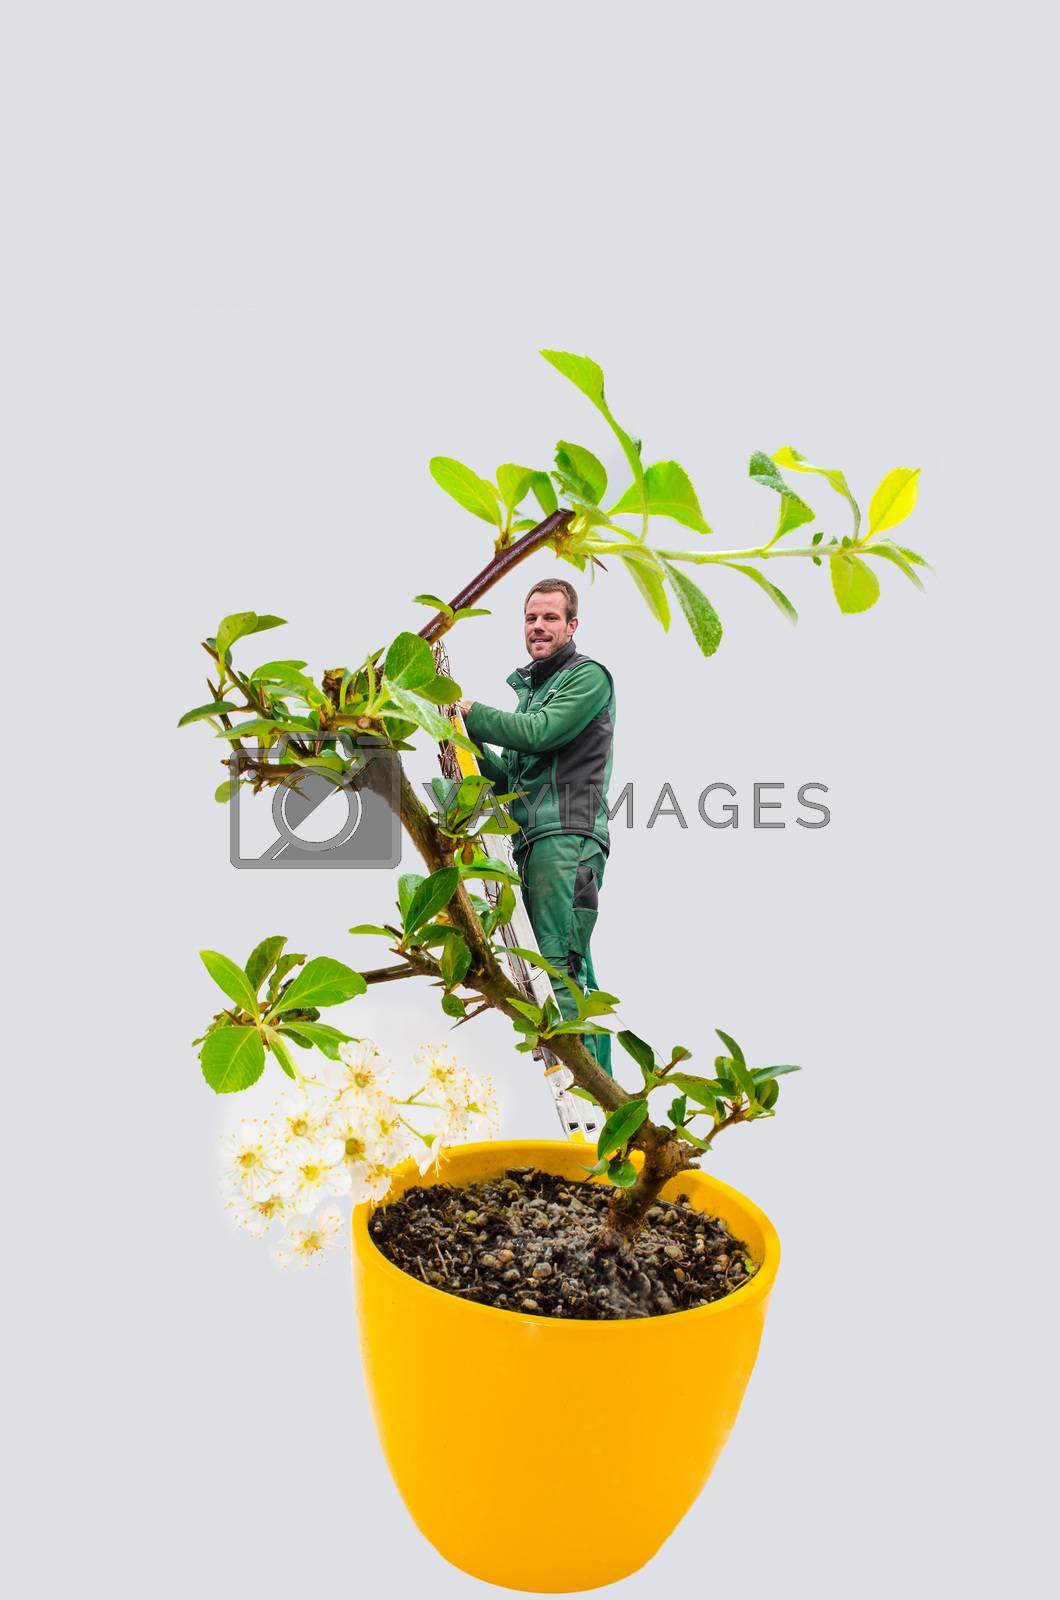 Royalty free image of Man bonsai tree by JFsPic